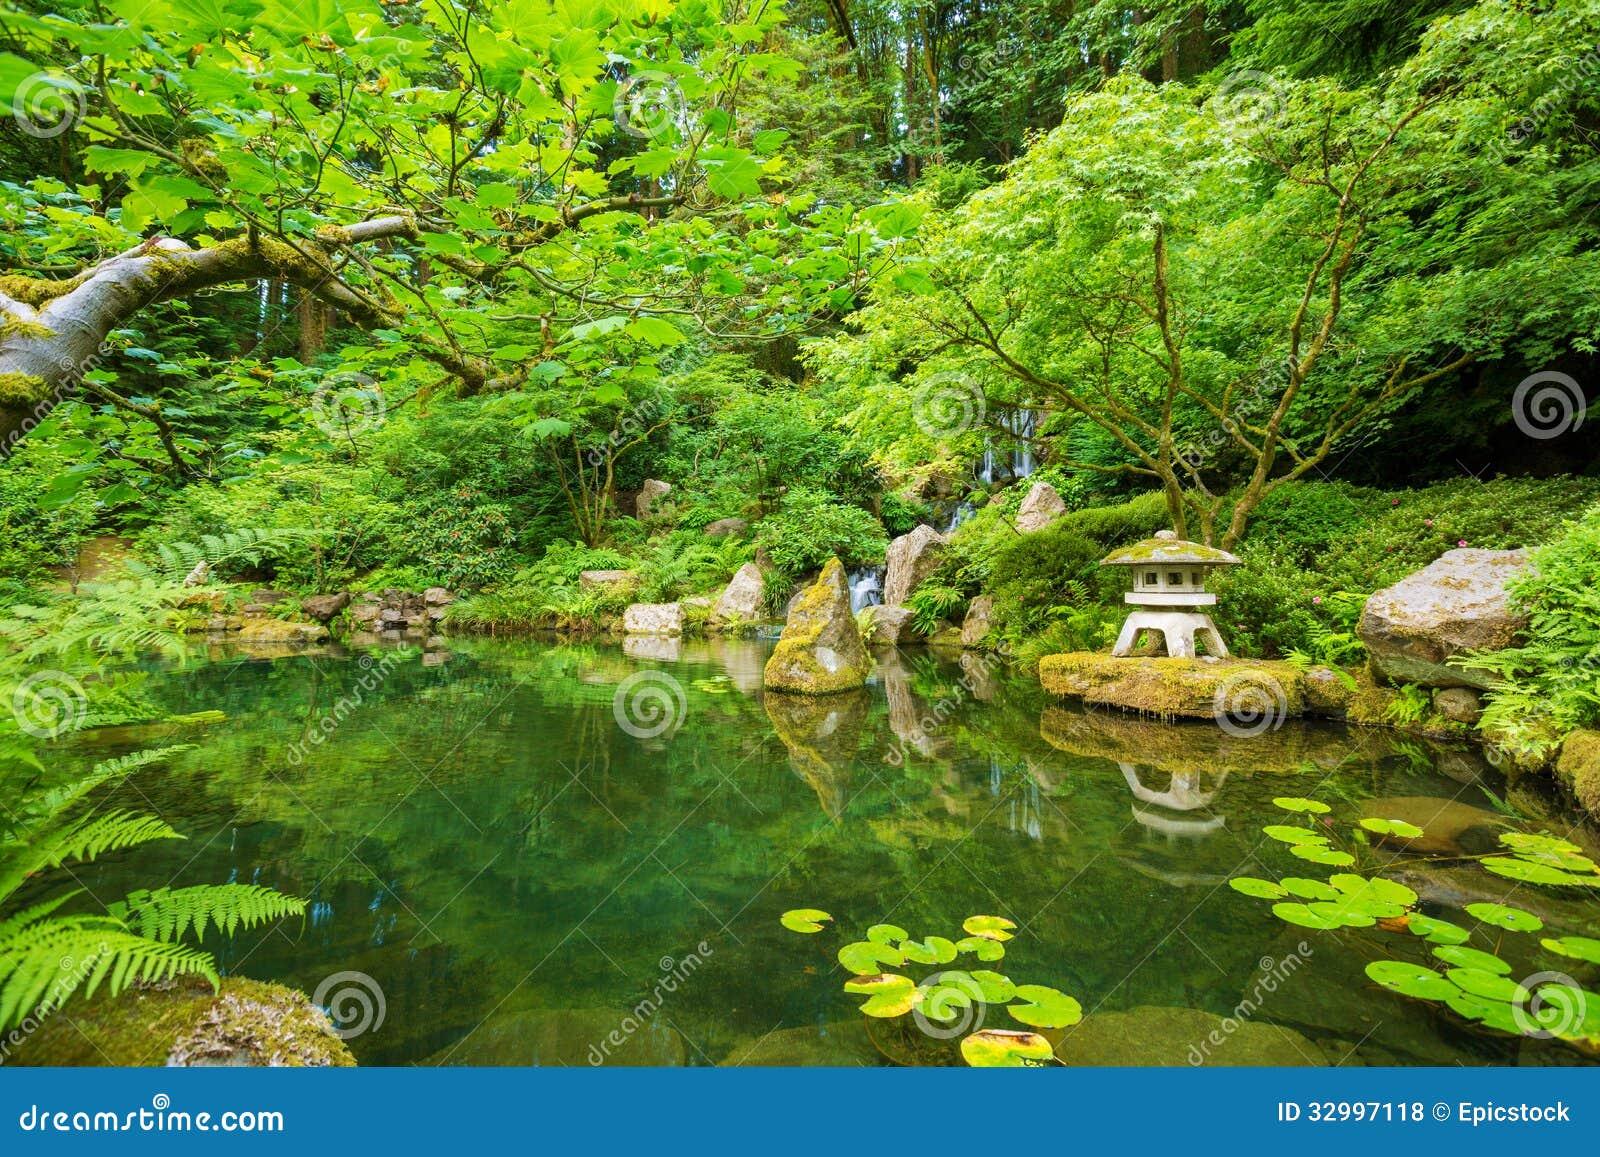 Beautiful japanese garden royalty free stock photos for Amazing japanese zen garden design